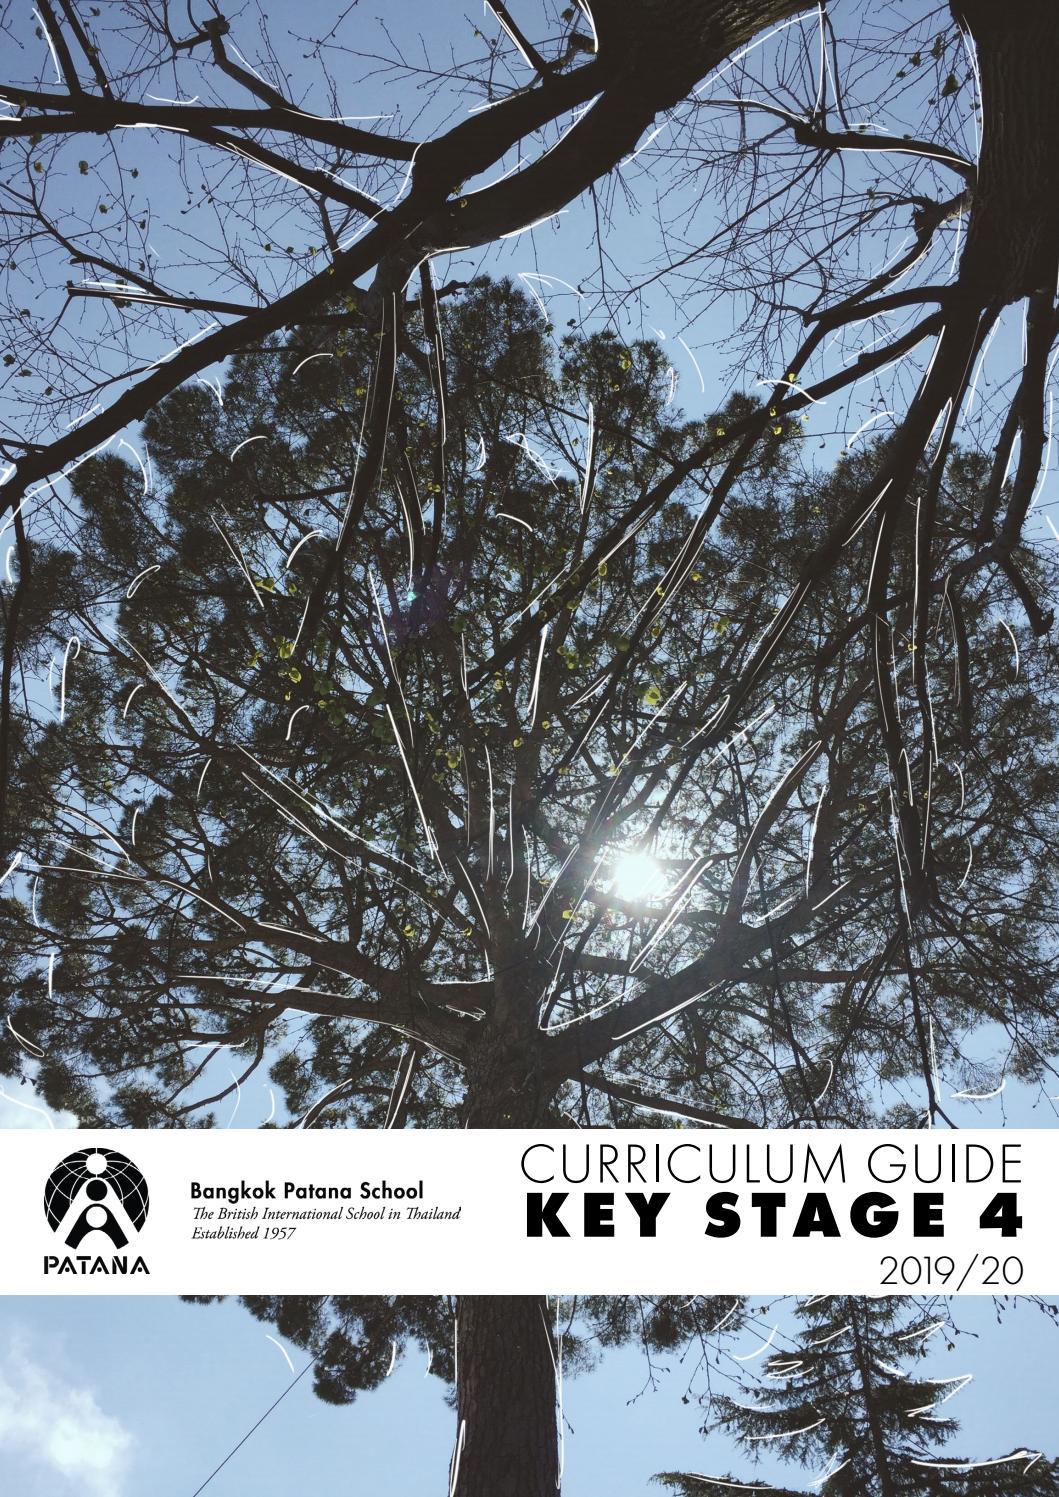 Key Stage 4 Curriculum Guide by Bangkok Patana School - issuu